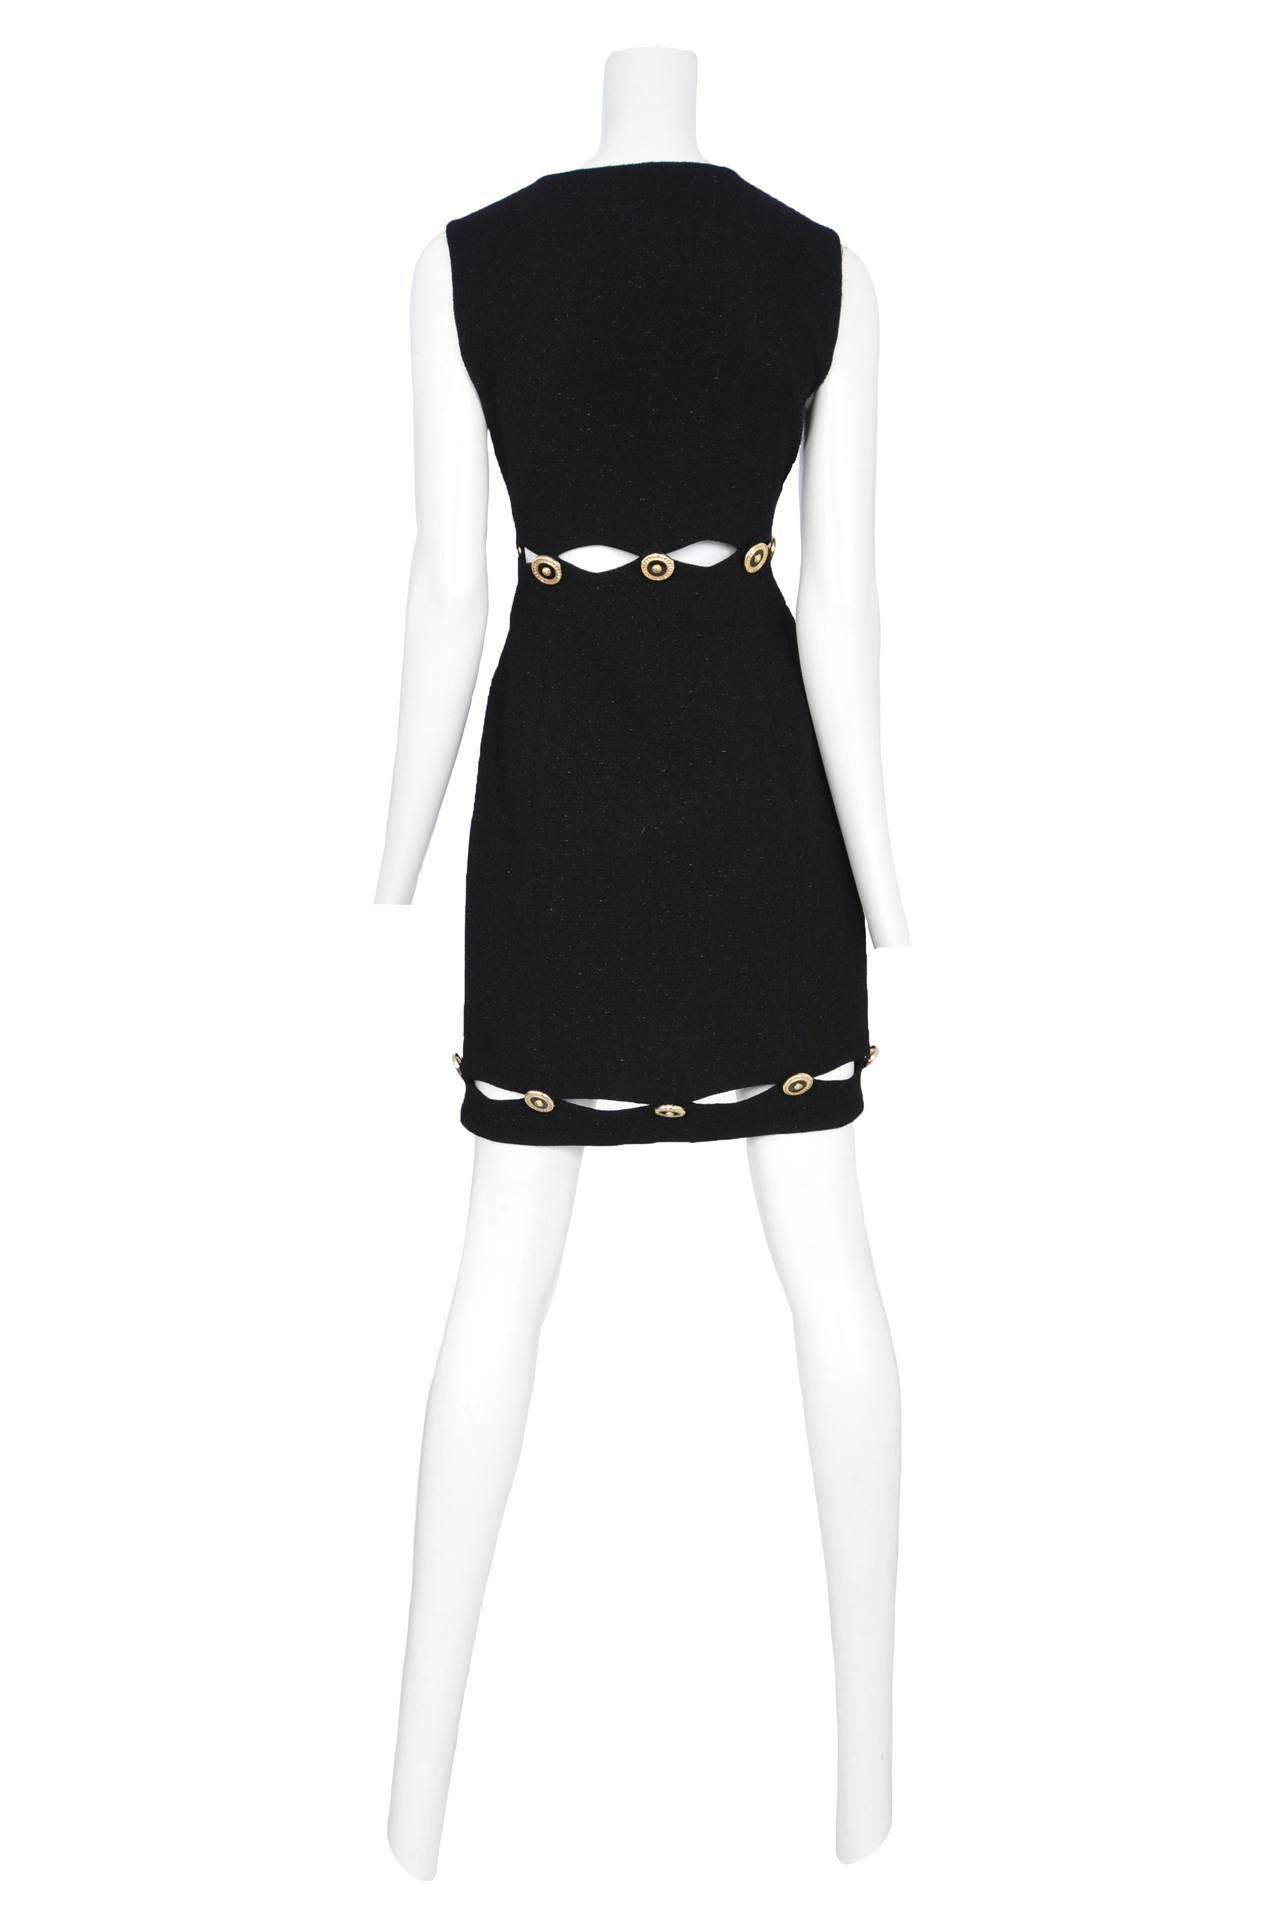 Versace Black slit medallion dress 2